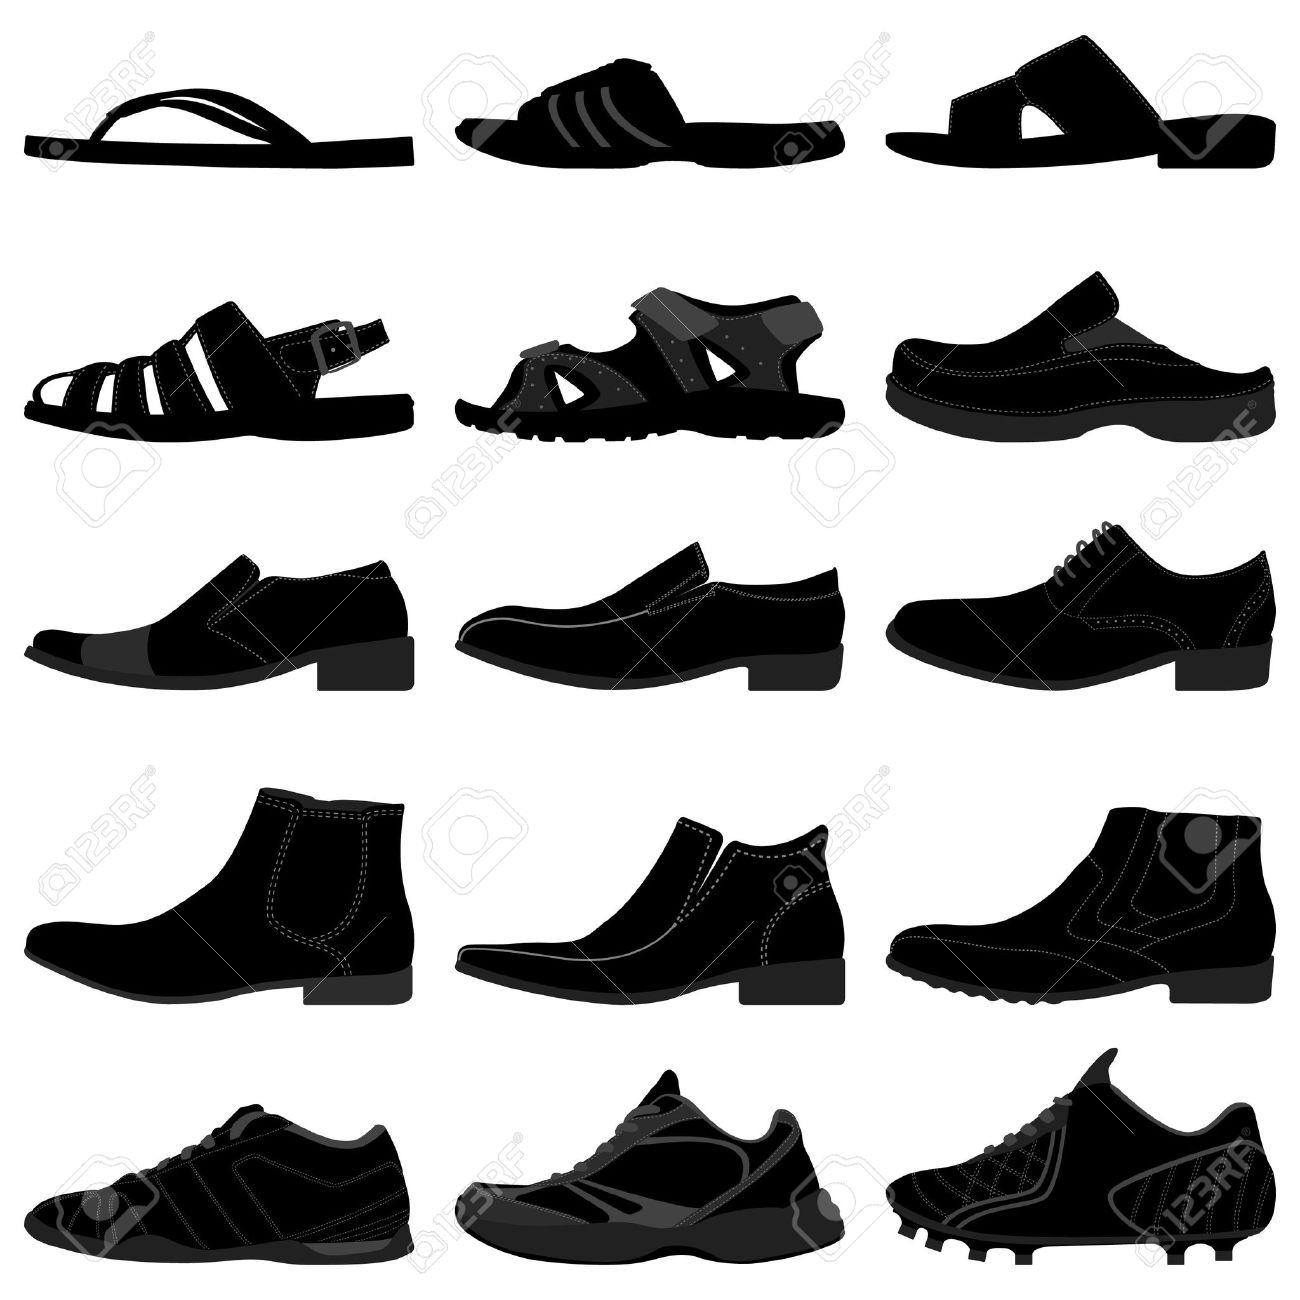 b3cd0bc4d8f Man Male Men Shoes Footwear Stock Vector - 18811990